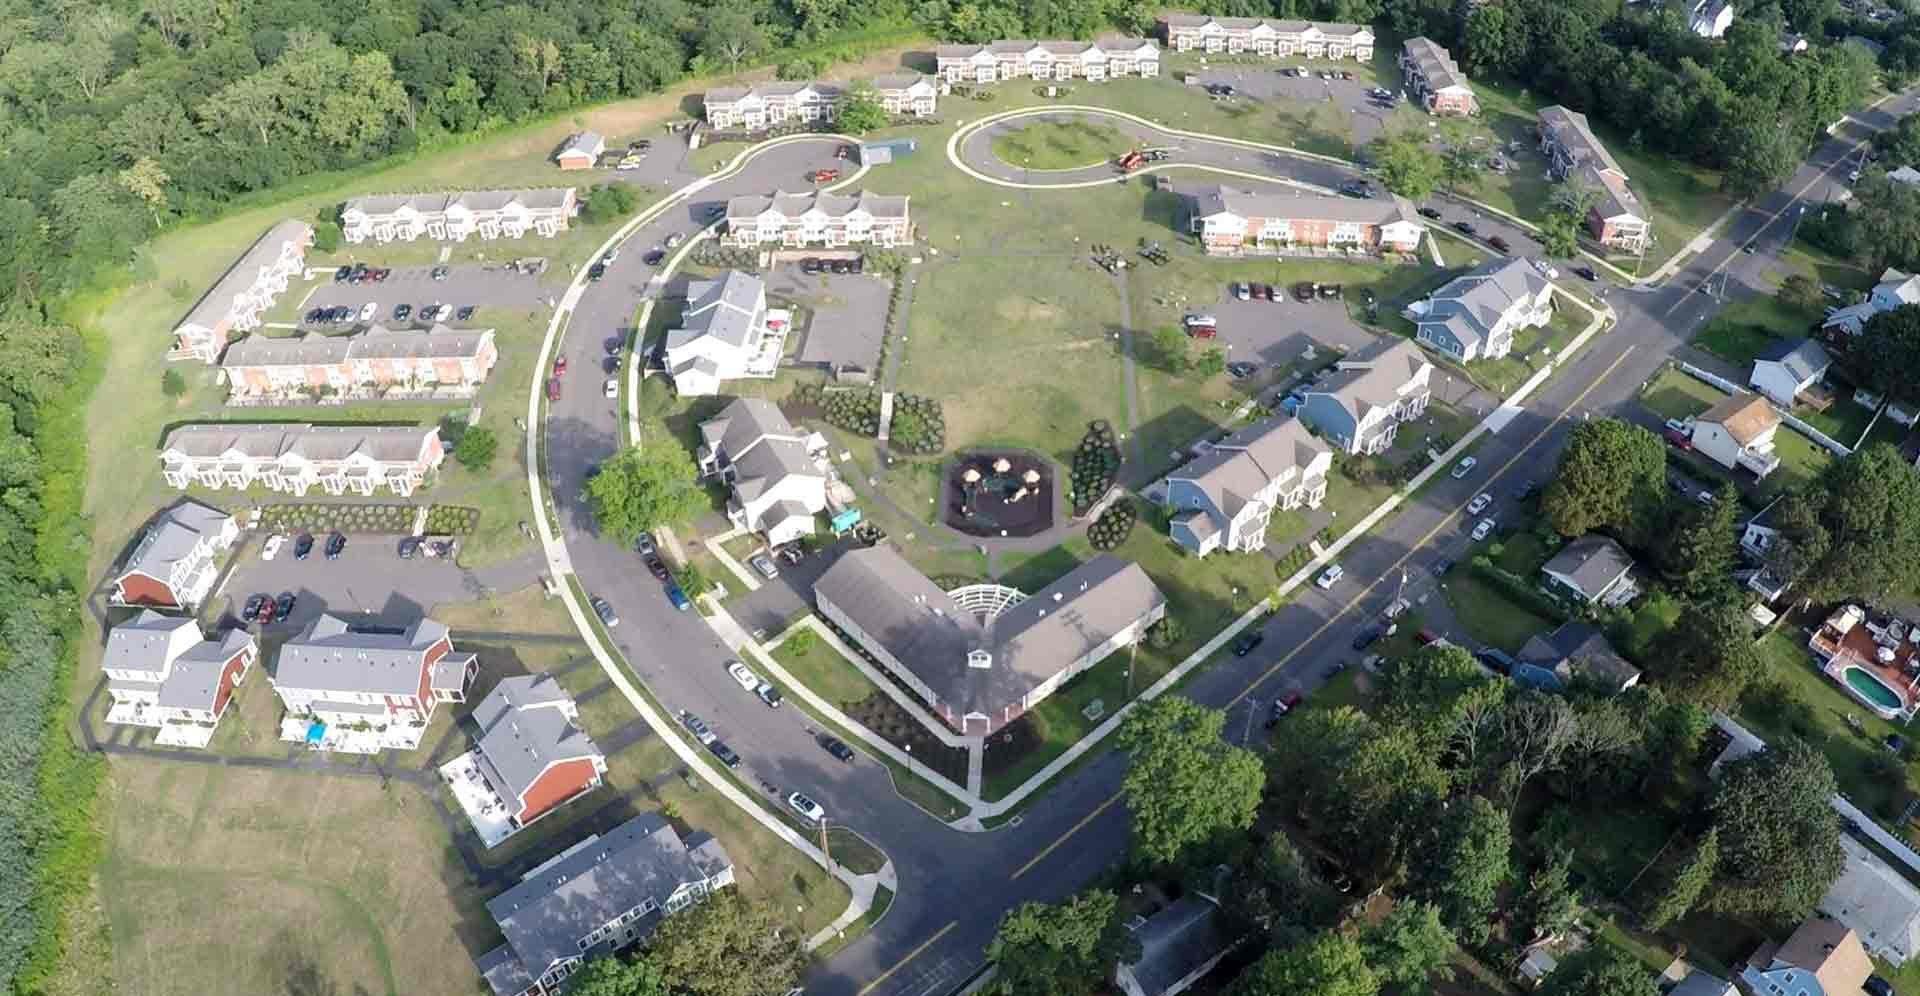 drone-EV2-site.jpg